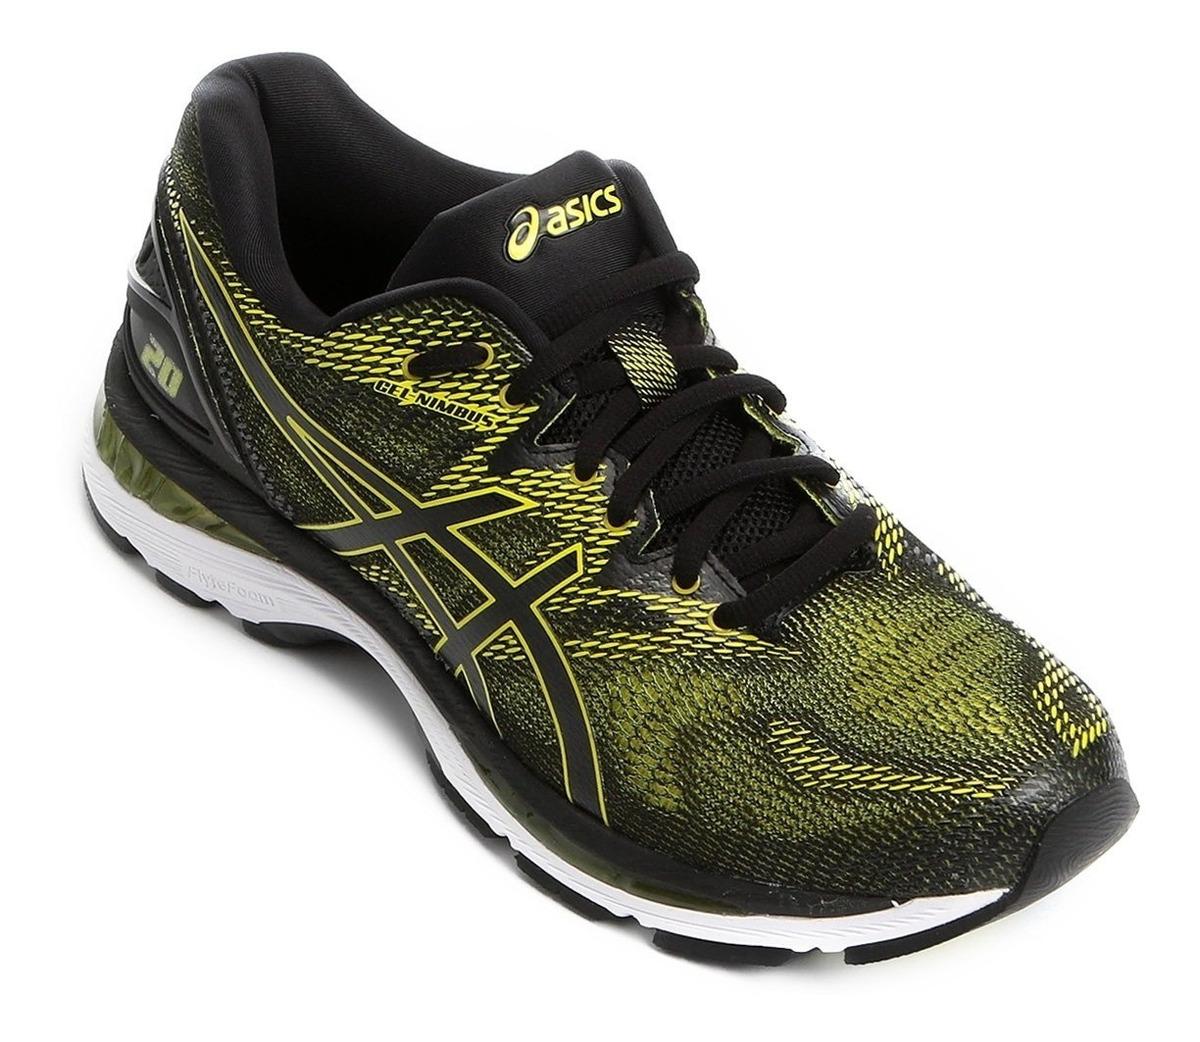 c3a8fa008b2b4 tenis asics gel-nimbus 20 masculino - preto/amarelo neon. Carregando zoom.